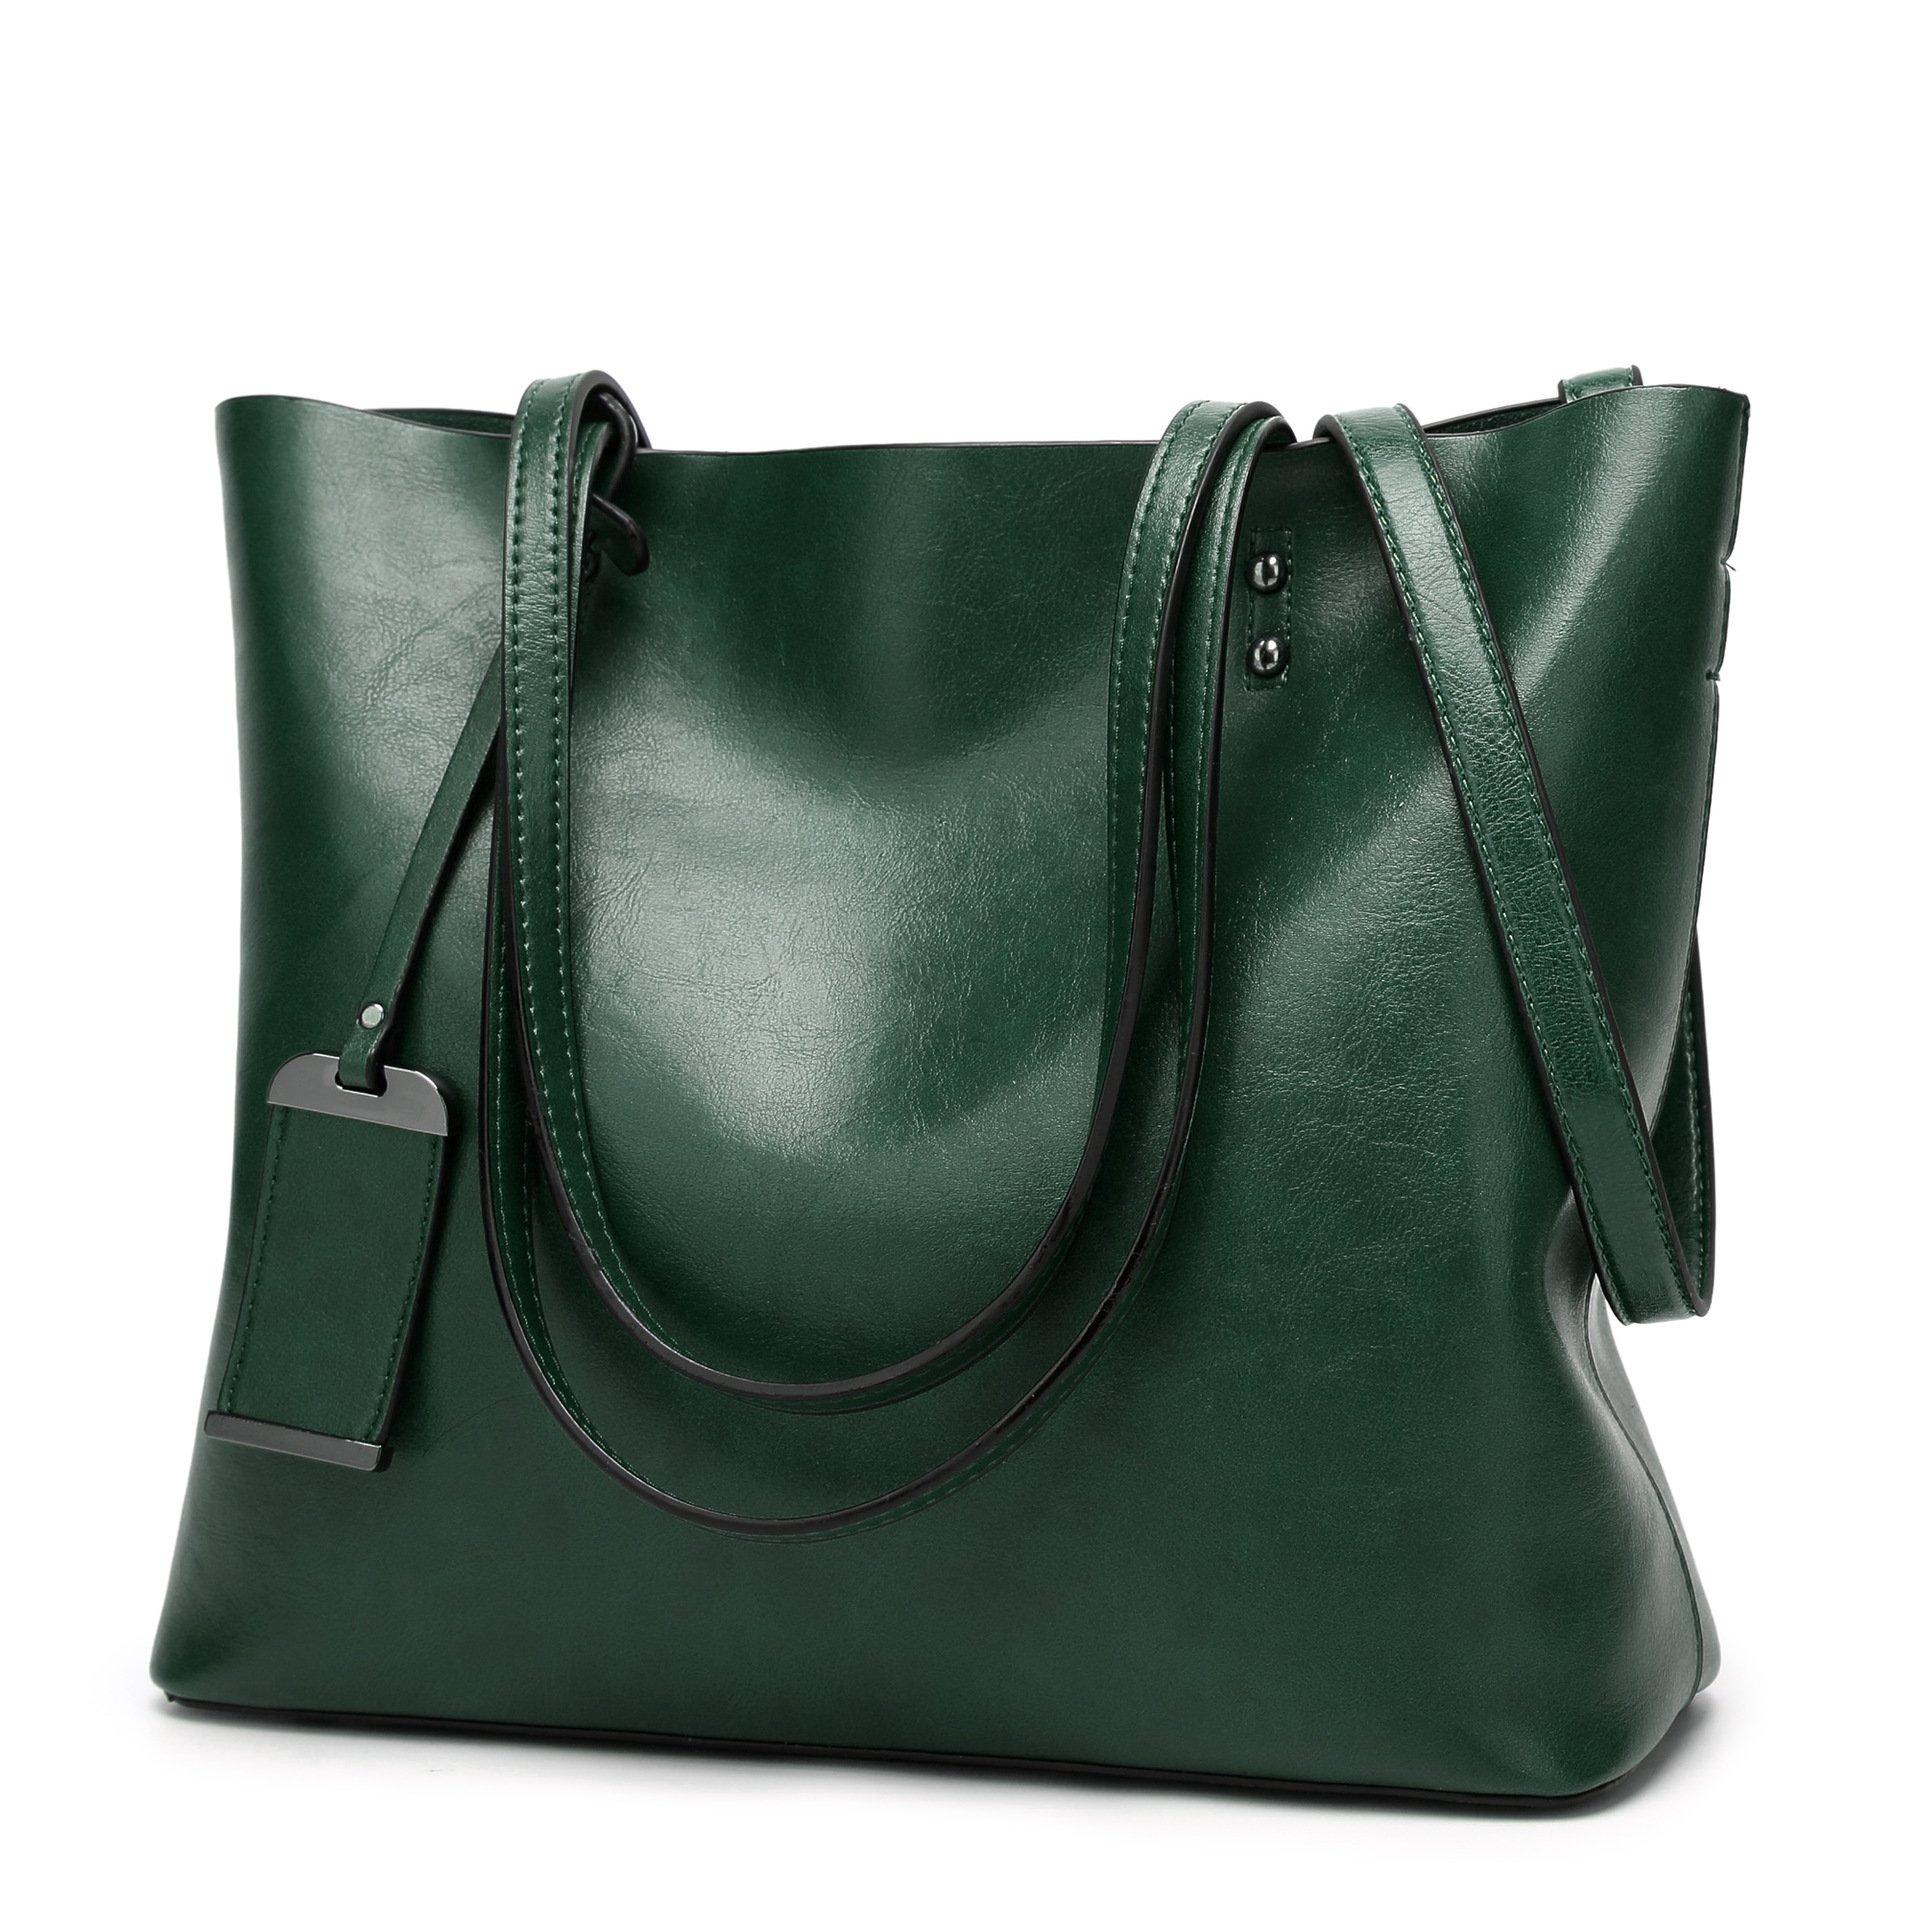 Obosoyo Women Shoulder Tote Satchel Bag Lady Messenger Purse Top Handle Hobo Handbags Green